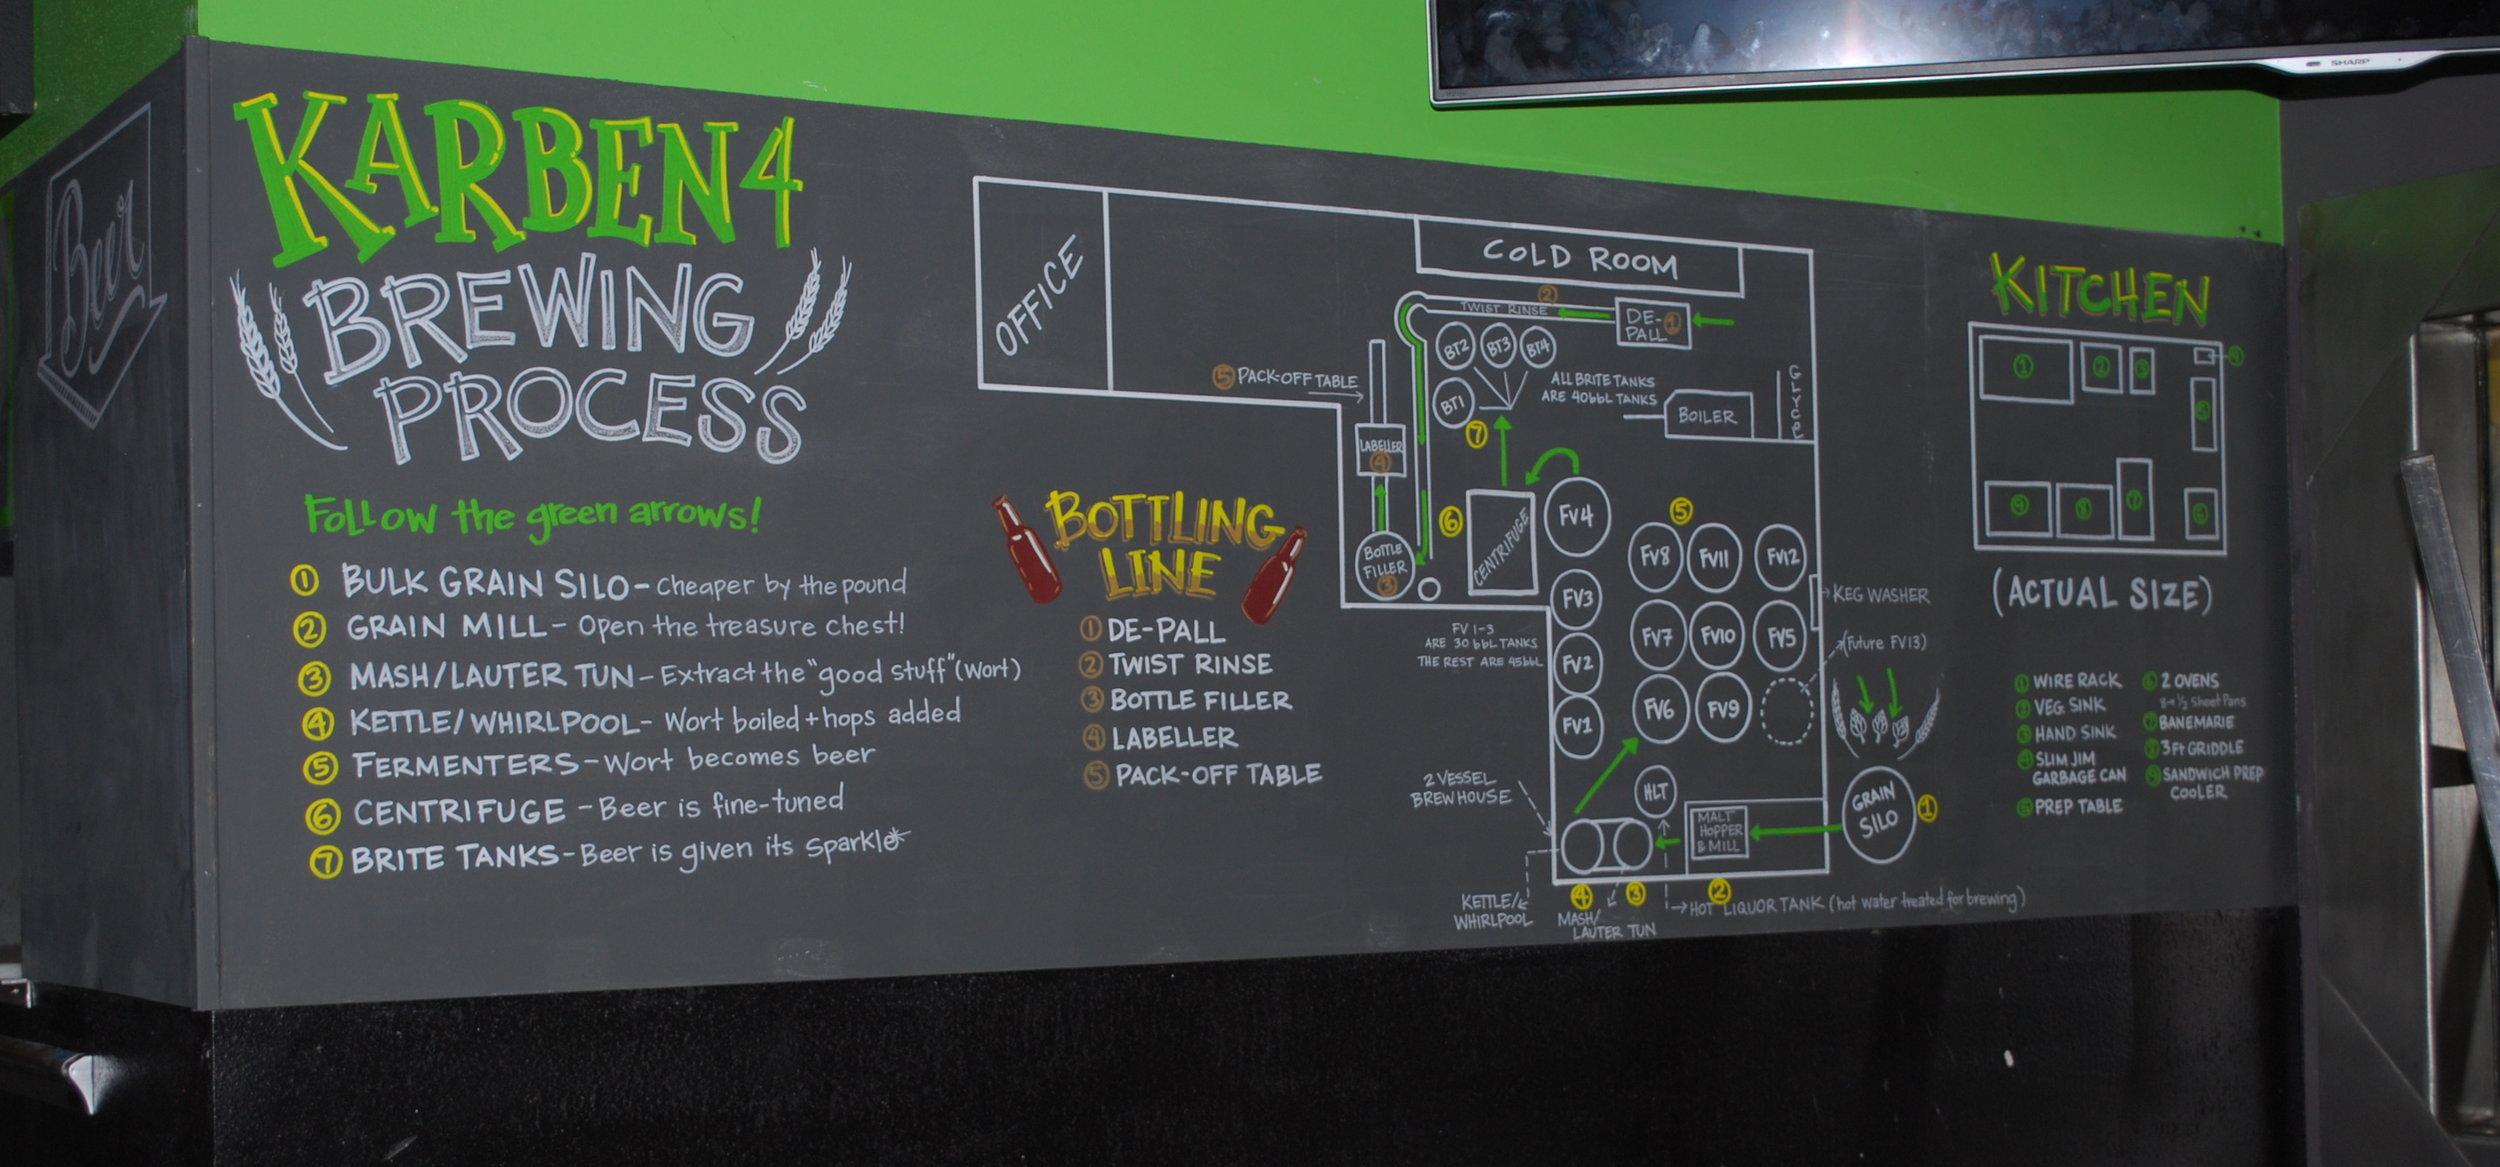 Karben4 Brewing Process Chalkboard Brewery.JPG